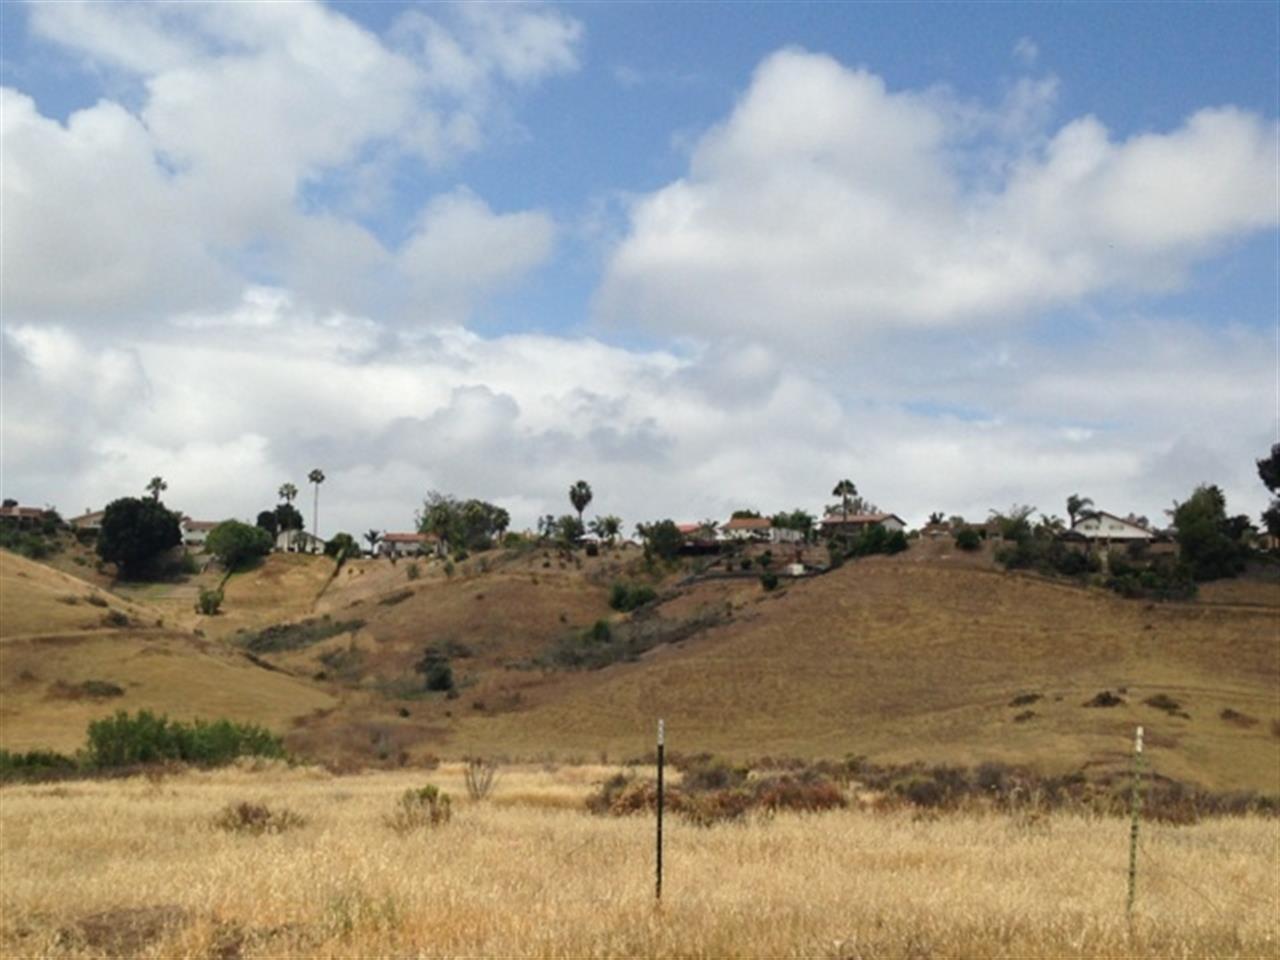 #Bonita #Bonita Highlands #LeadingRElocal